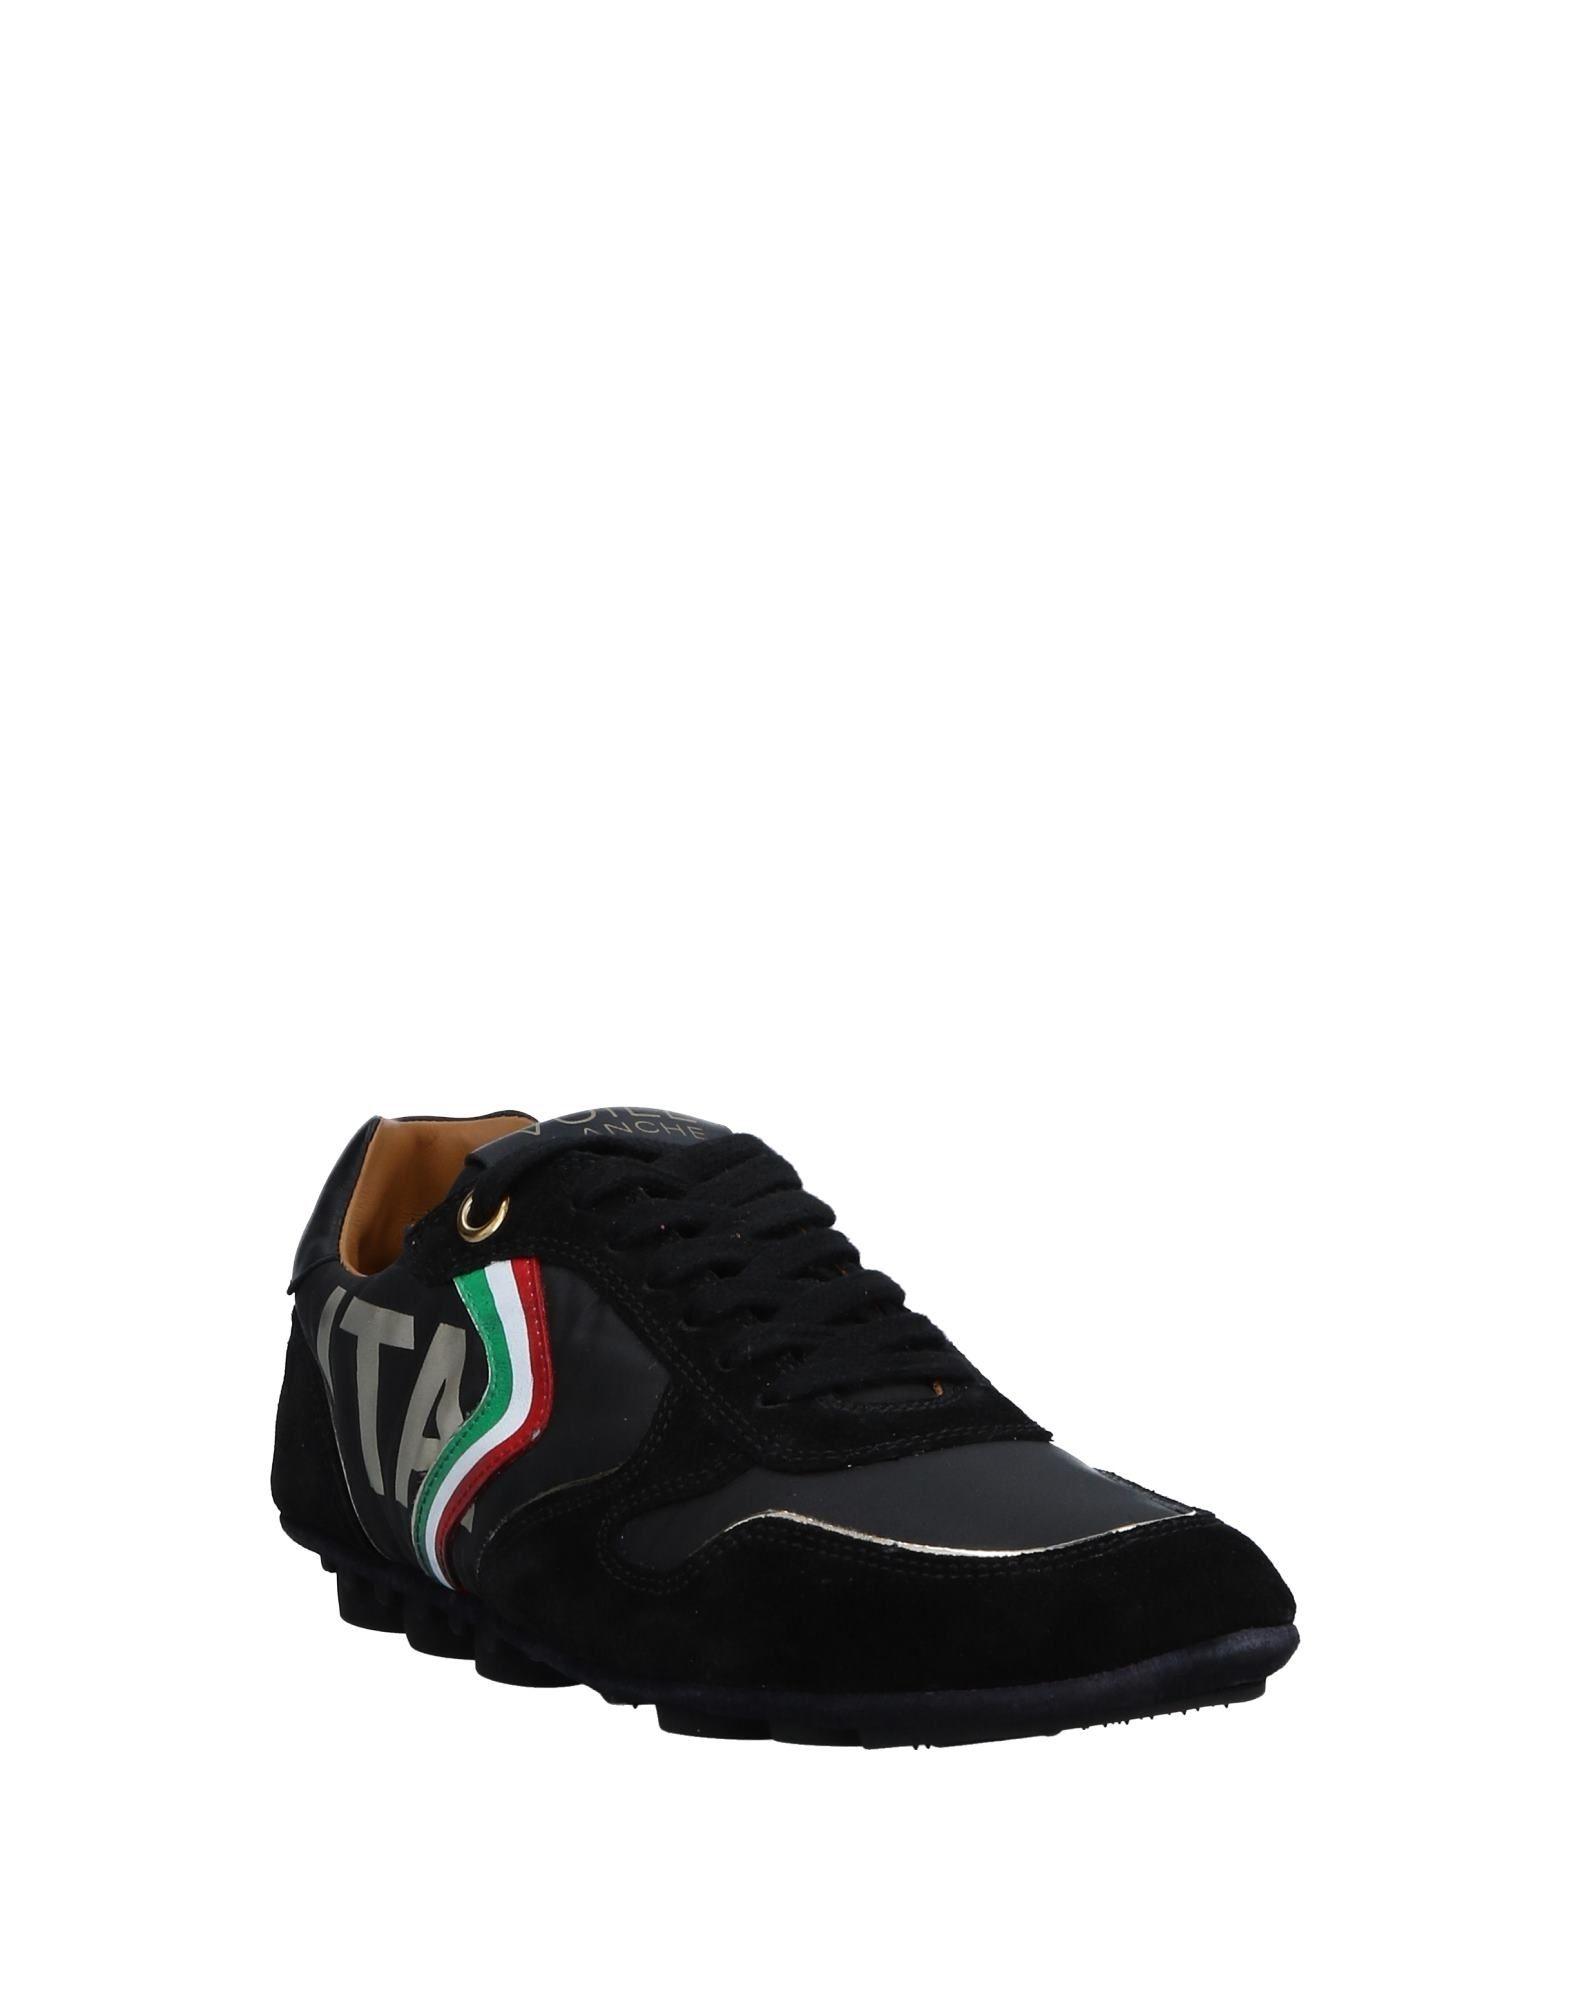 Voile Sneakers Blanche Sneakers Voile Damen Gutes Preis-Leistungs-Verhältnis, es lohnt sich 4389a4